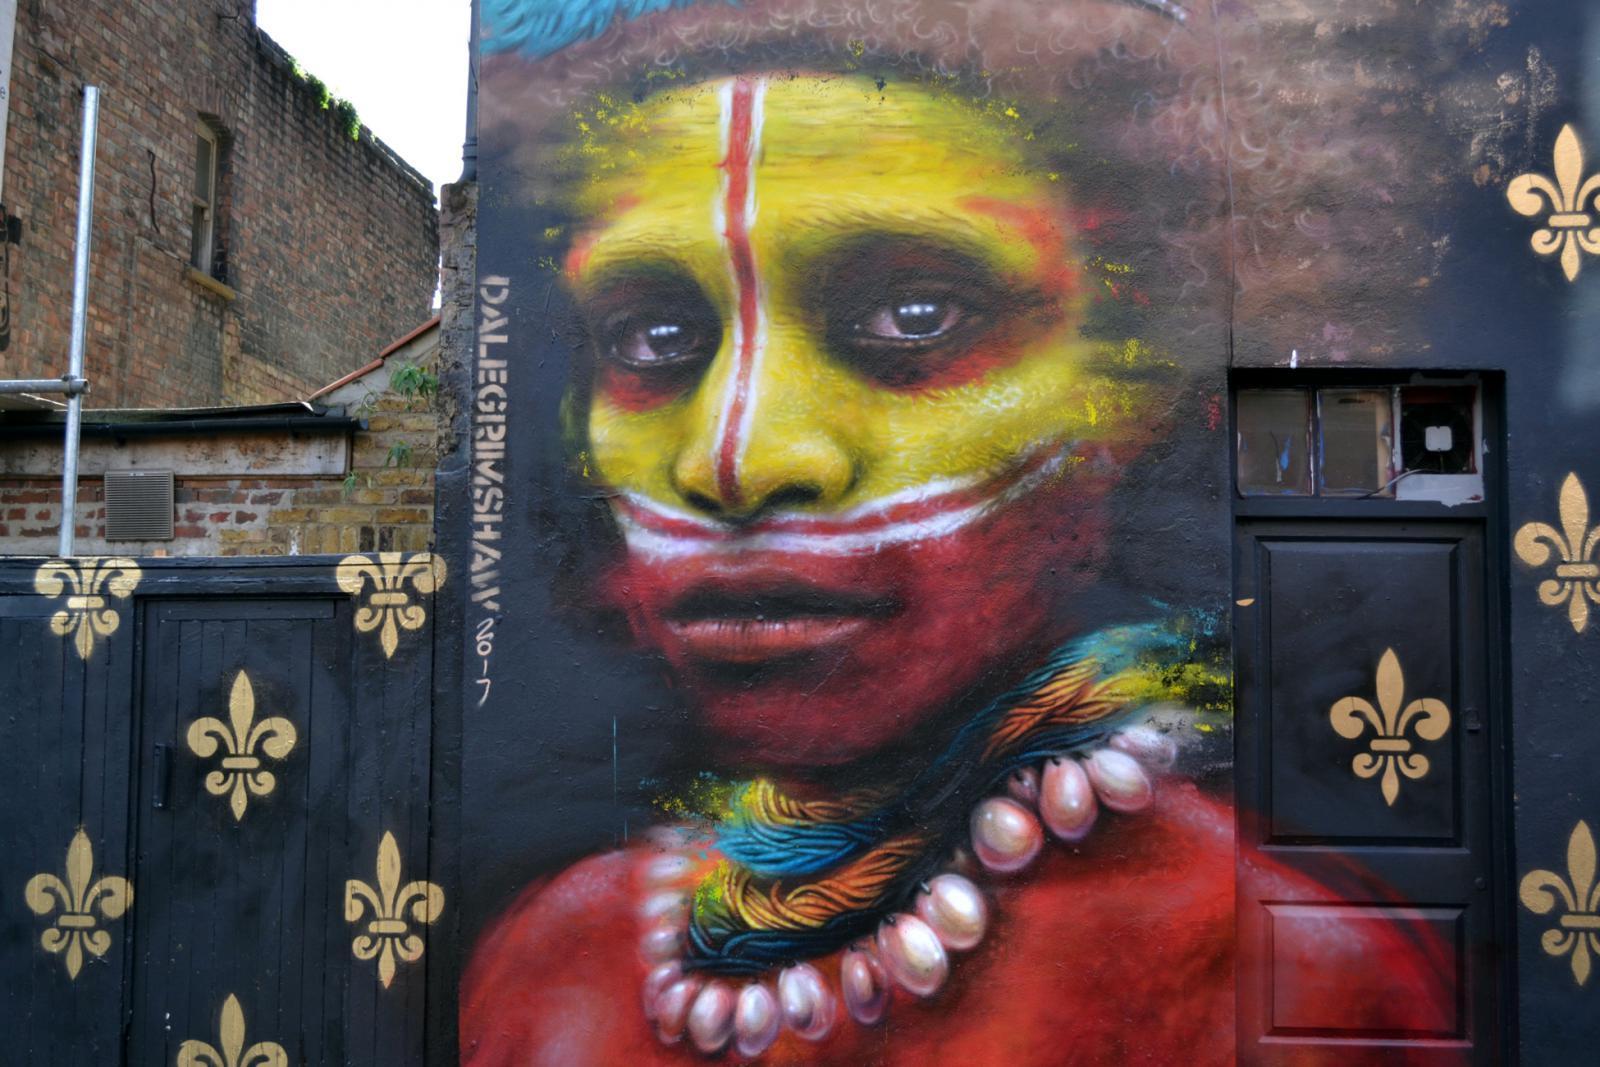 Streetart in der Brick Lane in London